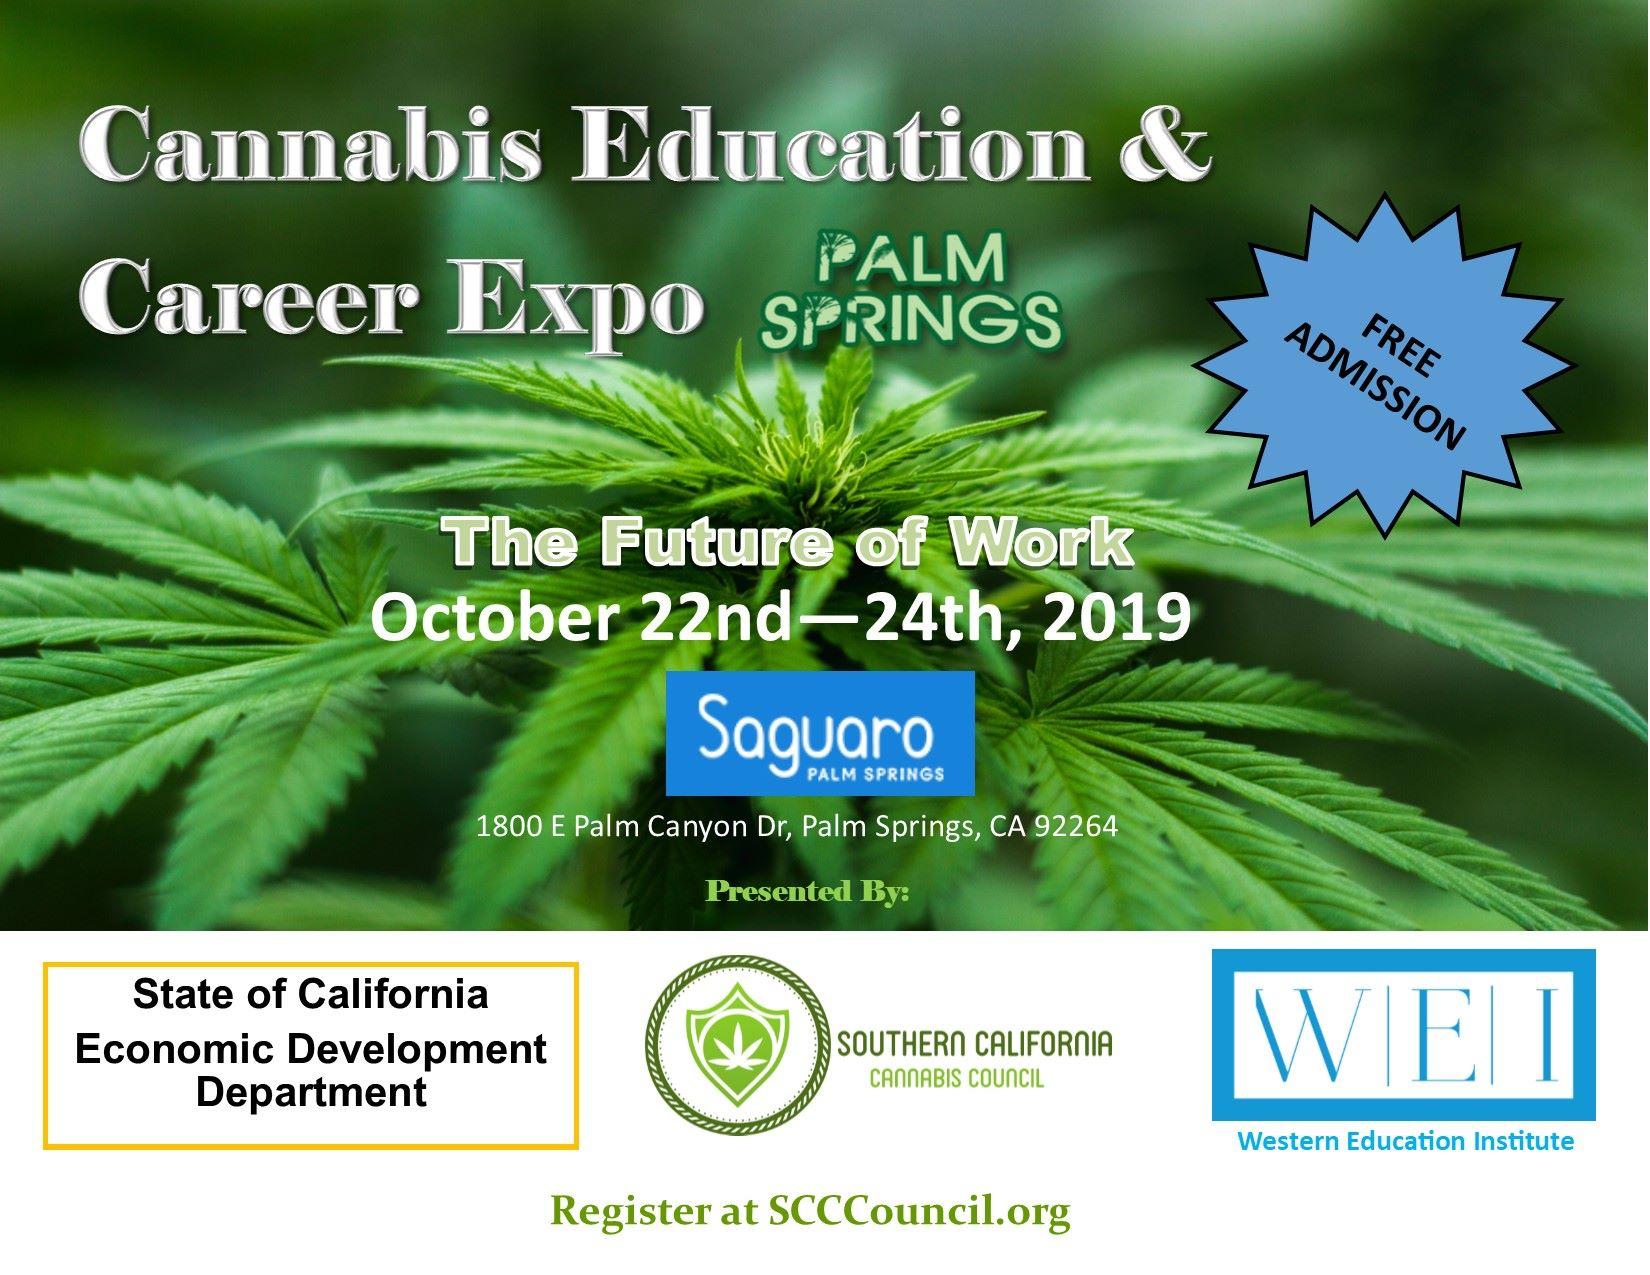 Cannabis Education and Career Expo